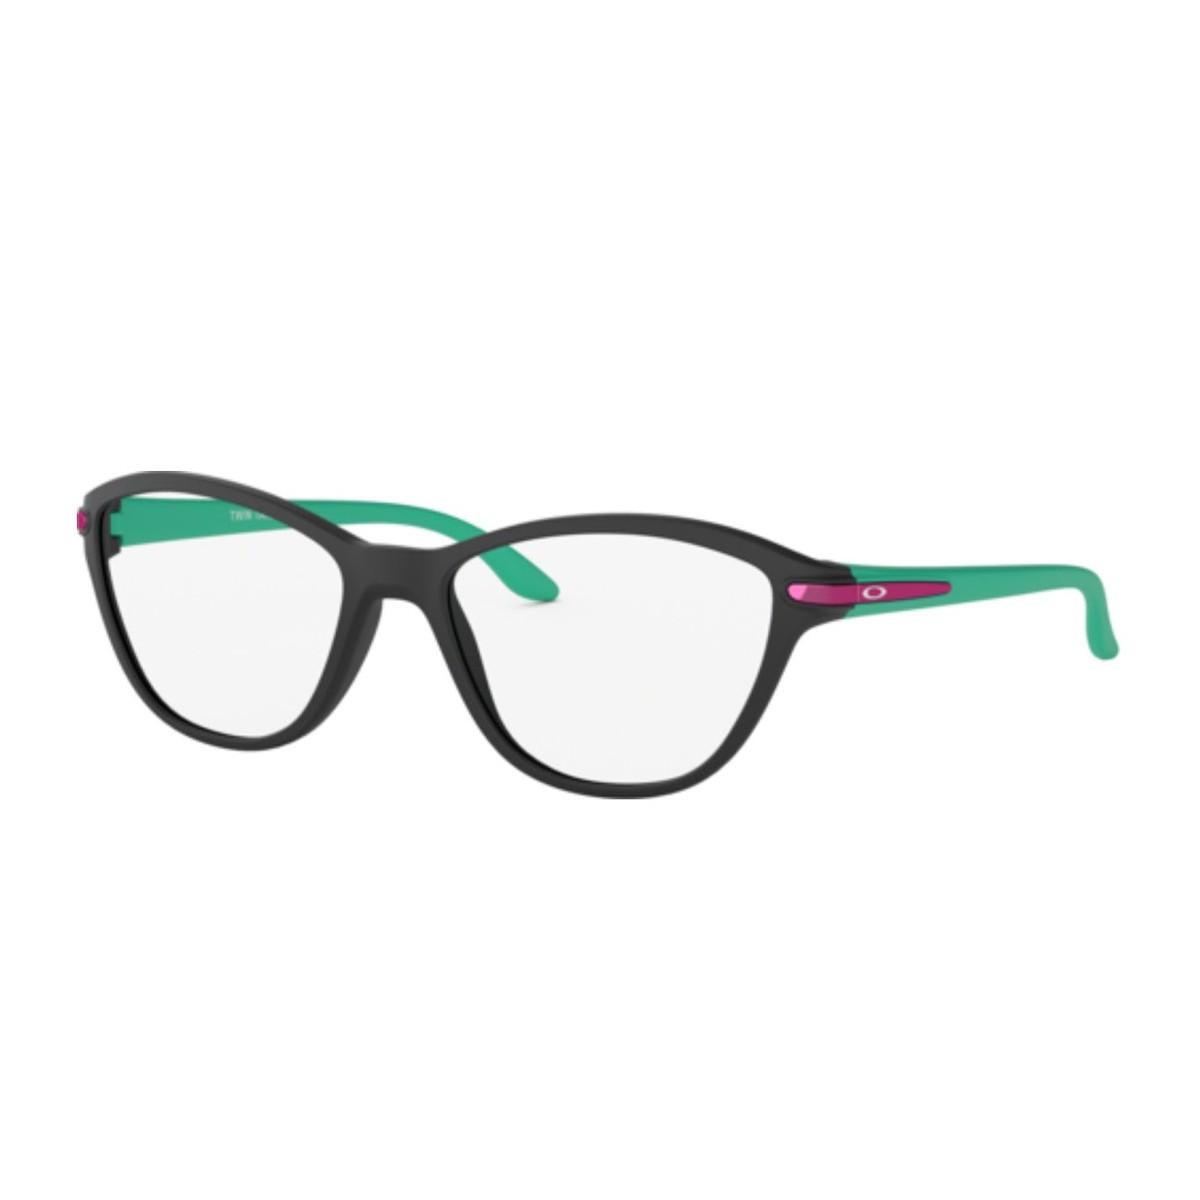 Oakley Youth Twin Tail OY8008 Junior | Kids eyeglasses